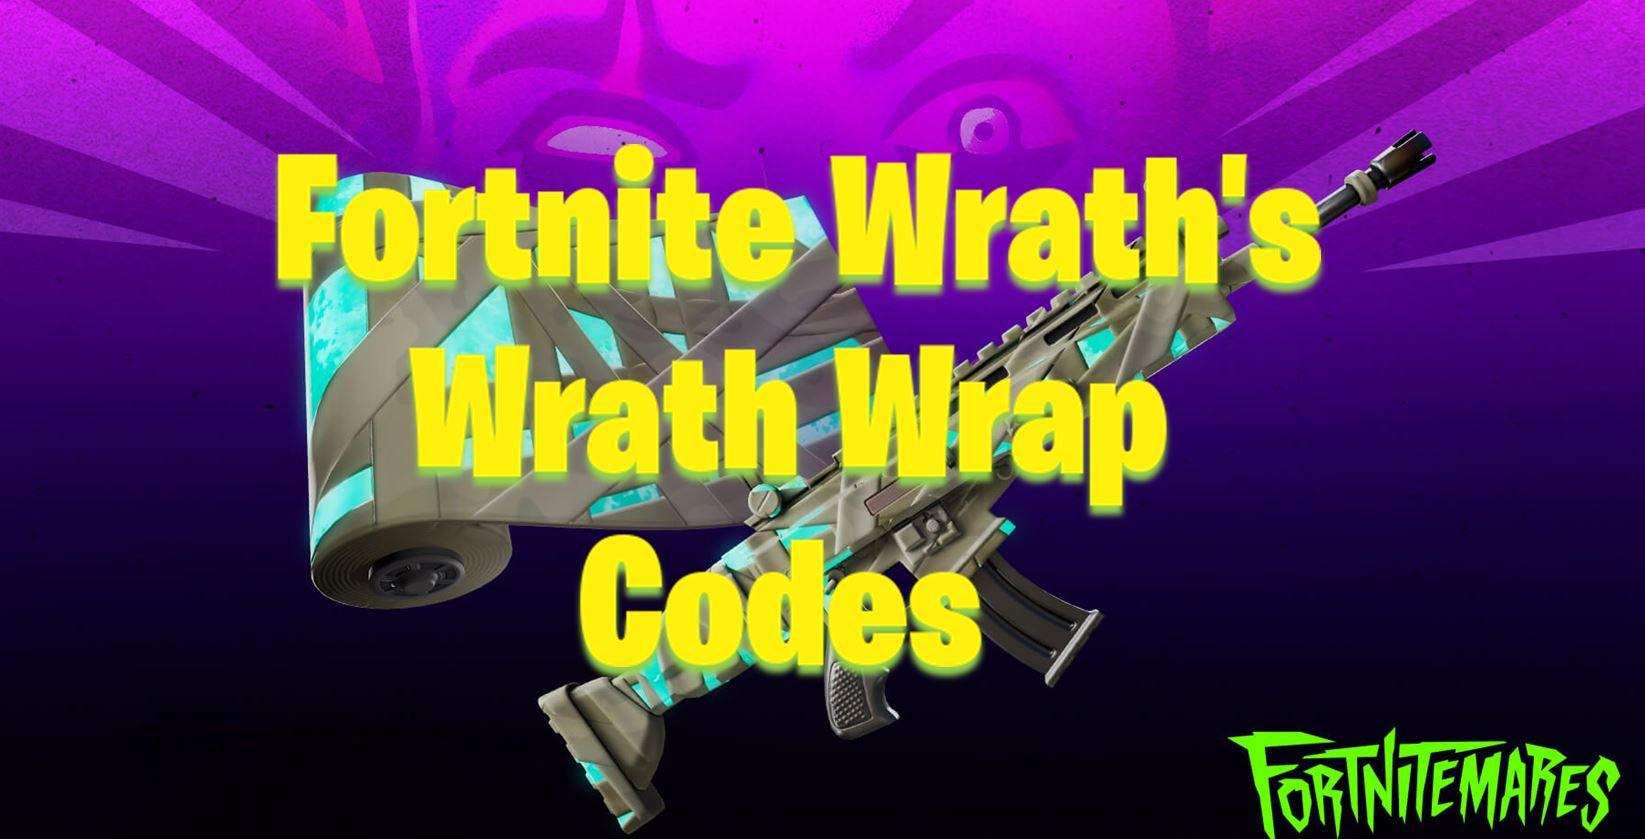 Redeem Free Fortnite Codes Free Fortnite Wrath S Wrath Wrap Code All Creative Mysterious Code Digits Fortnite Insider